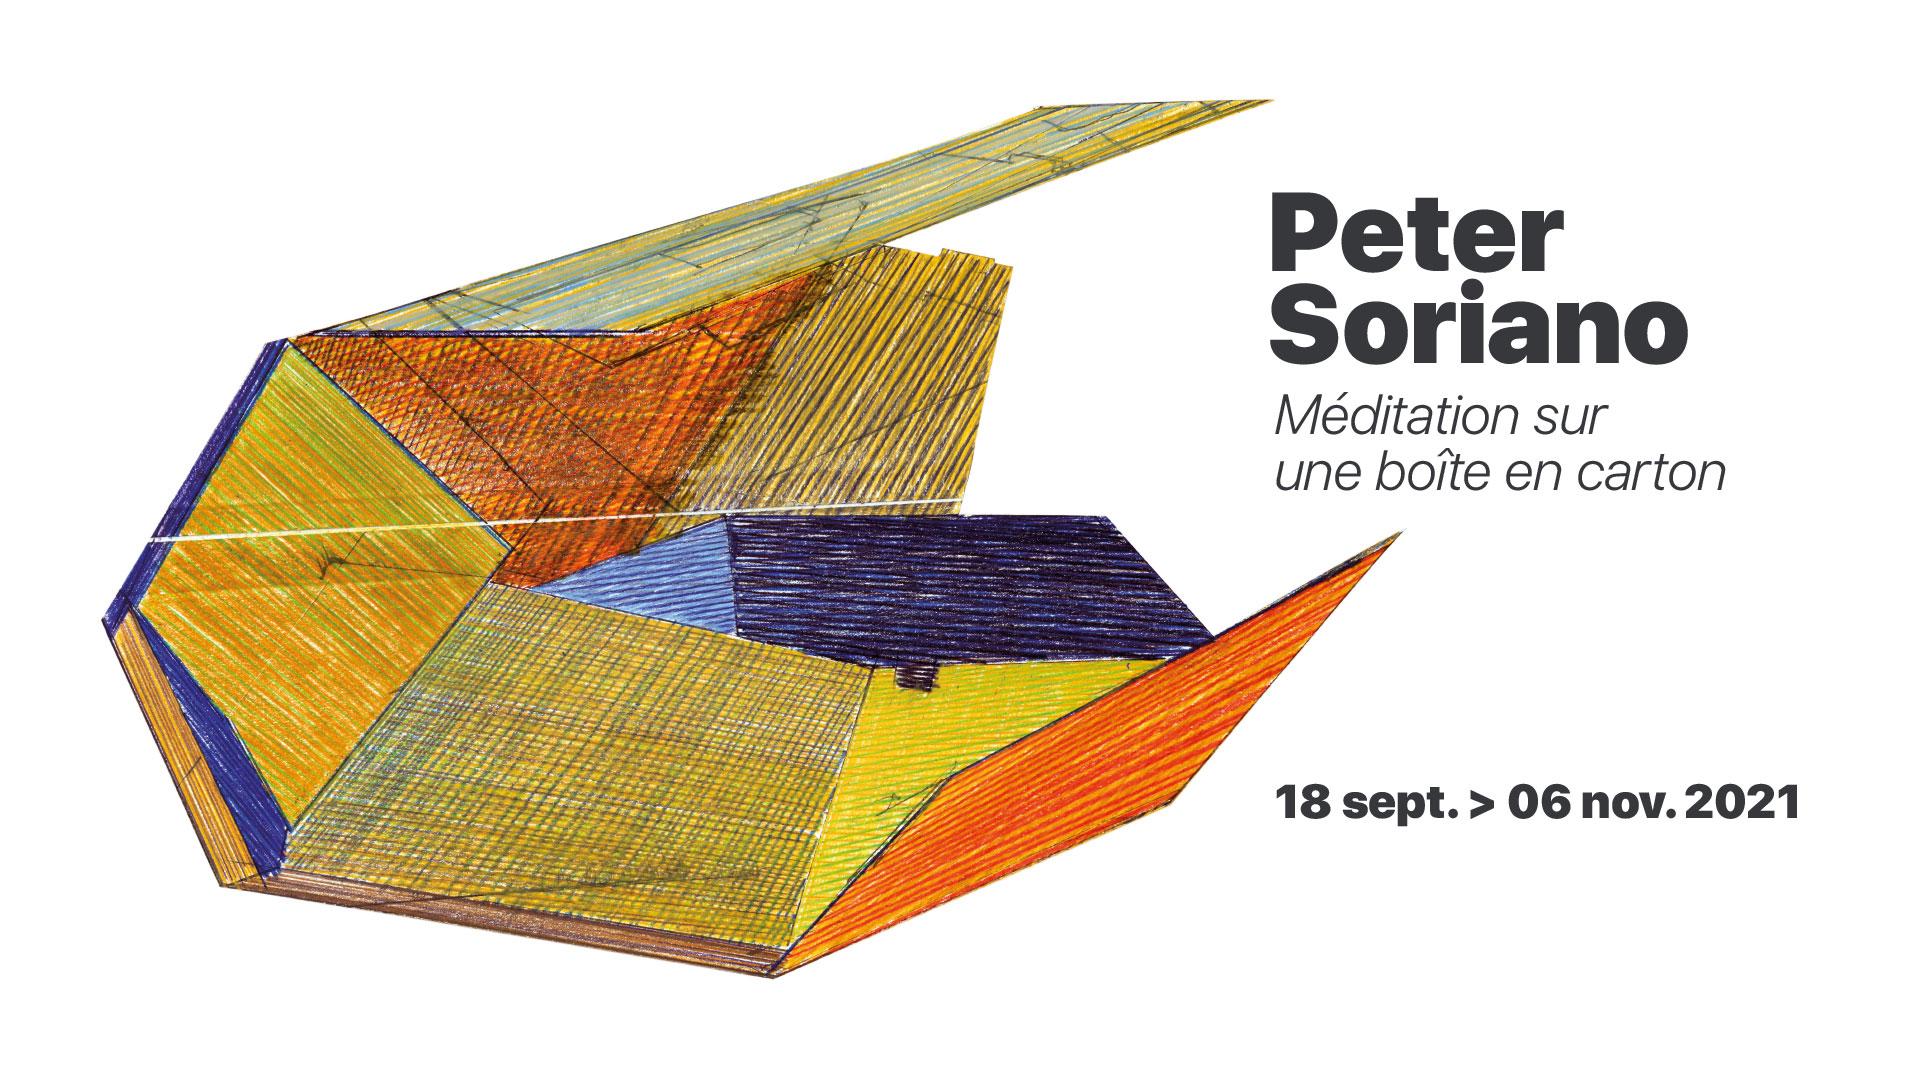 Peter Soriano Méditation sur une boîte en carton 18 sept. > 06 nov. 2021